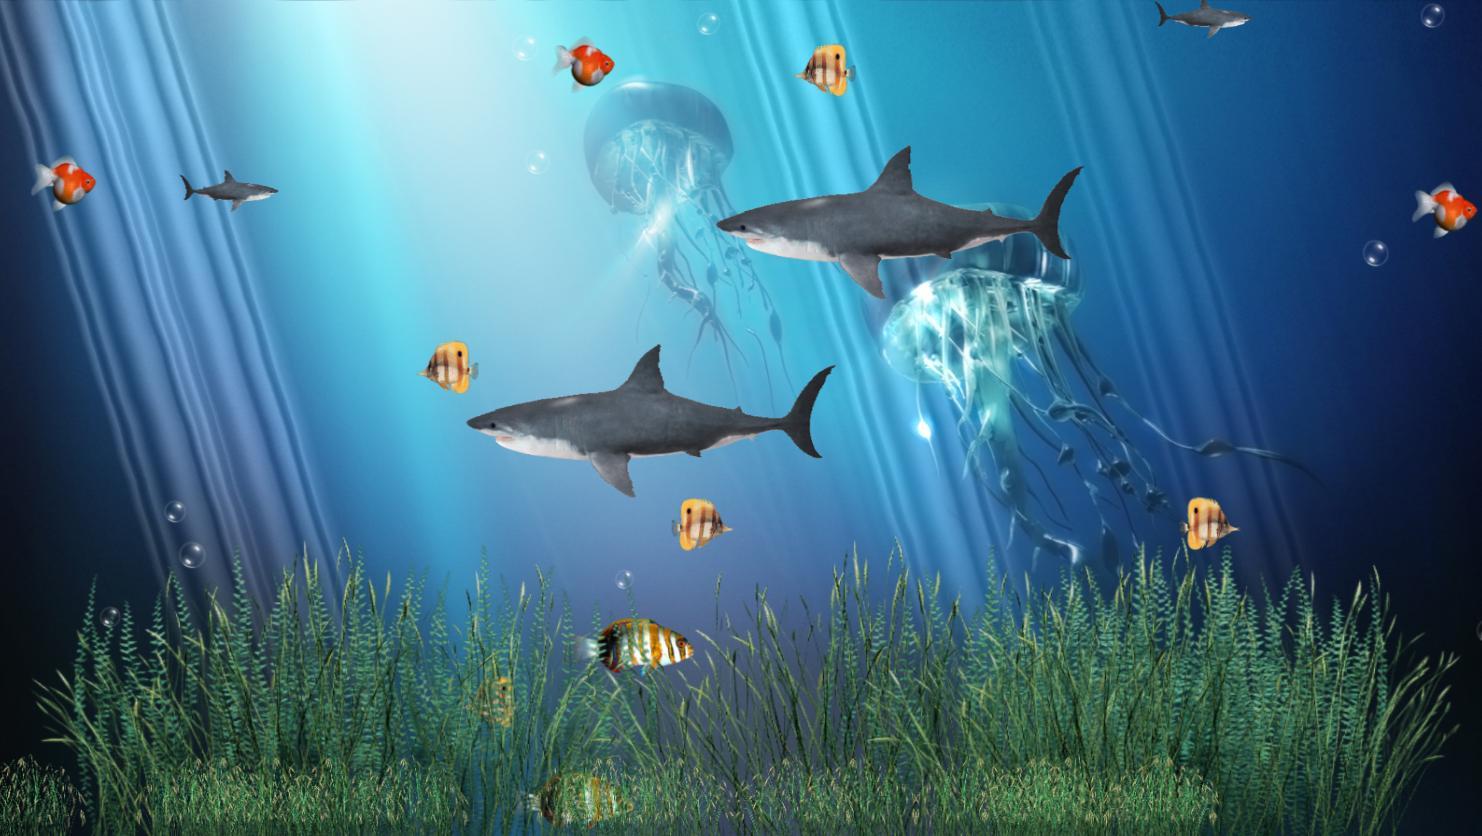 Wallpaper download moving - Direct Download Coral Reef Aquarium Animated Wallpaper Download